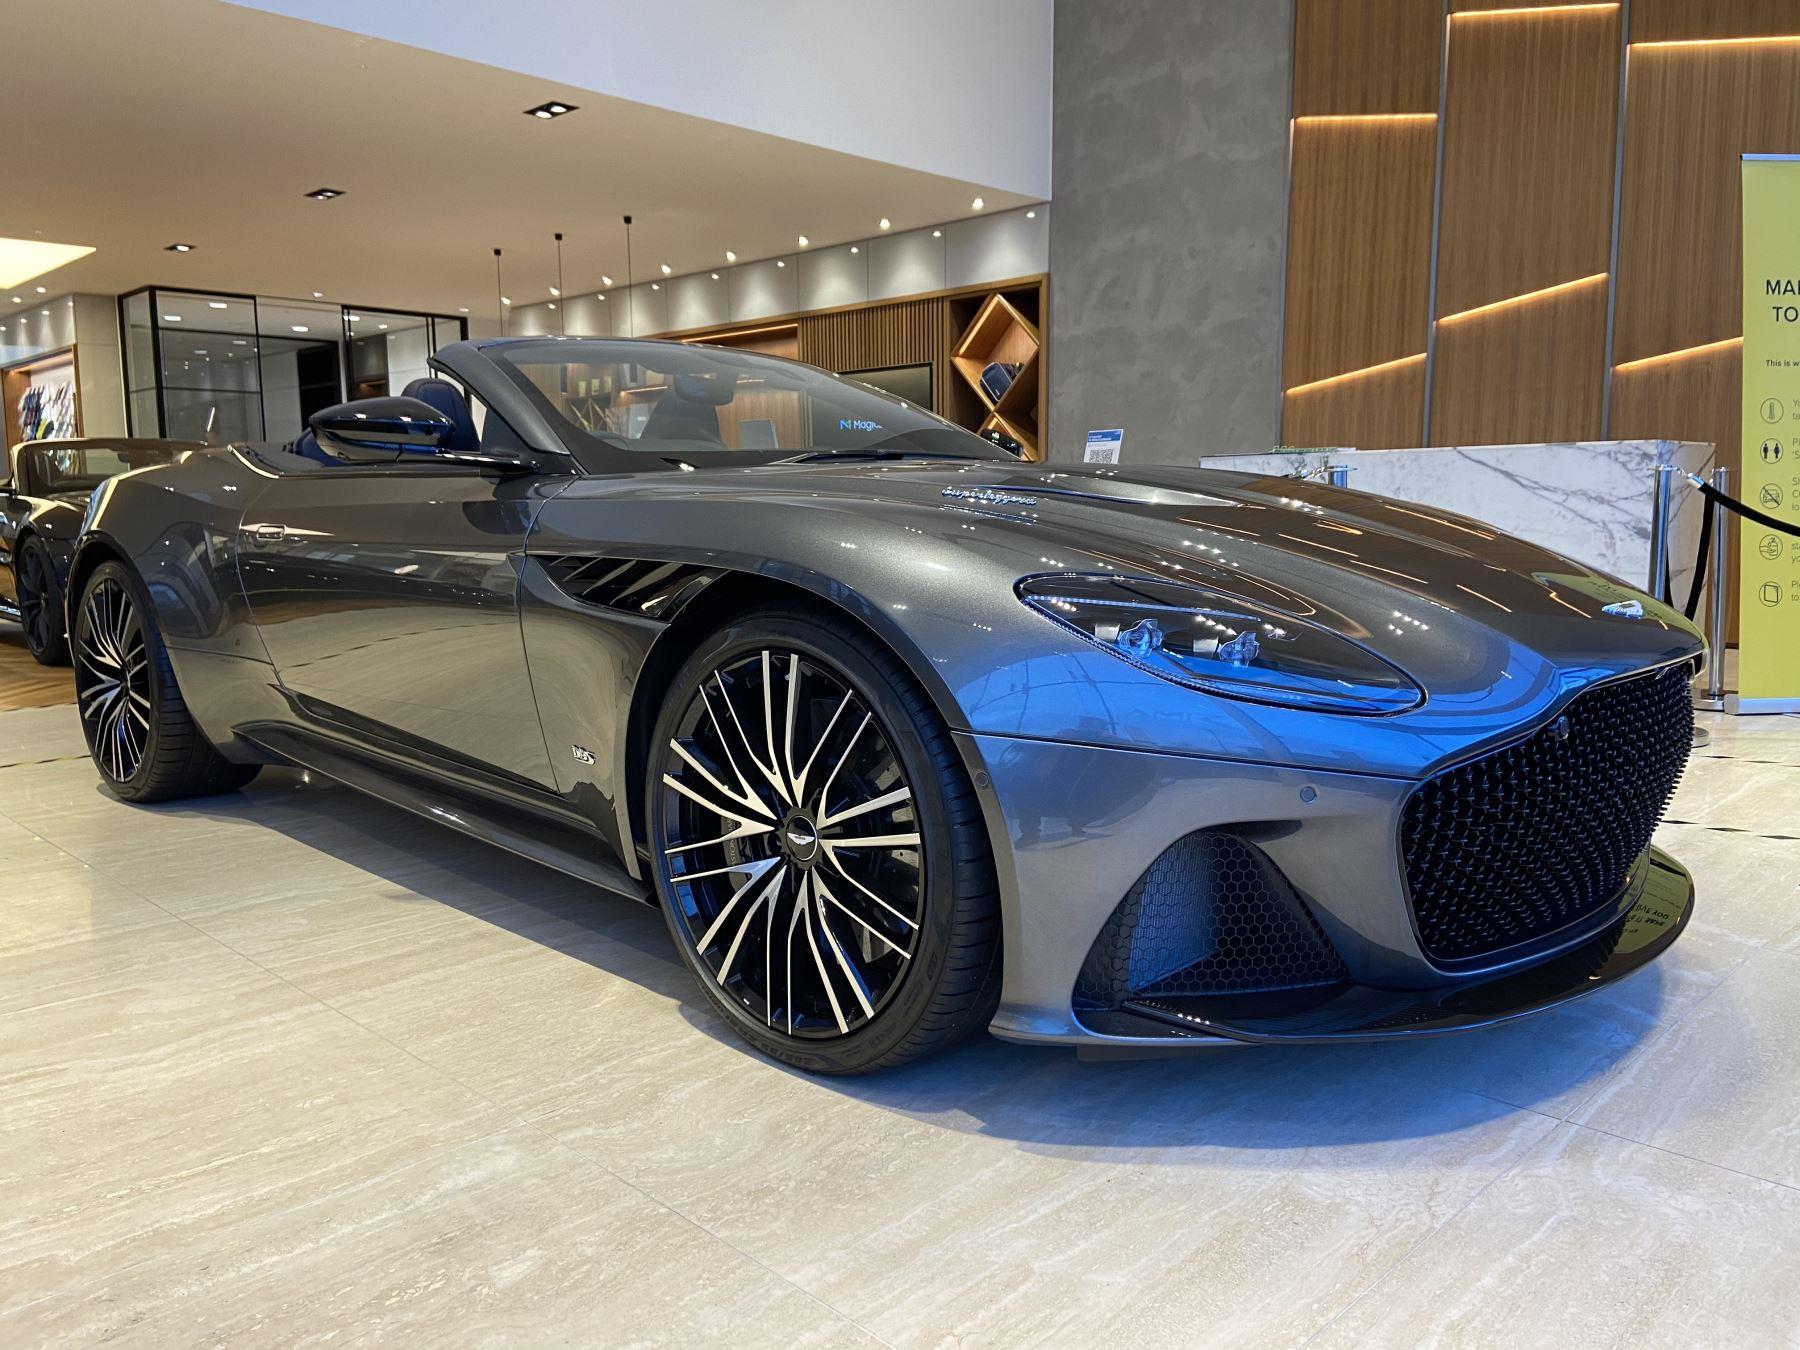 Aston Martin DBS V12 Superleggera Volante Touchtronic image 5